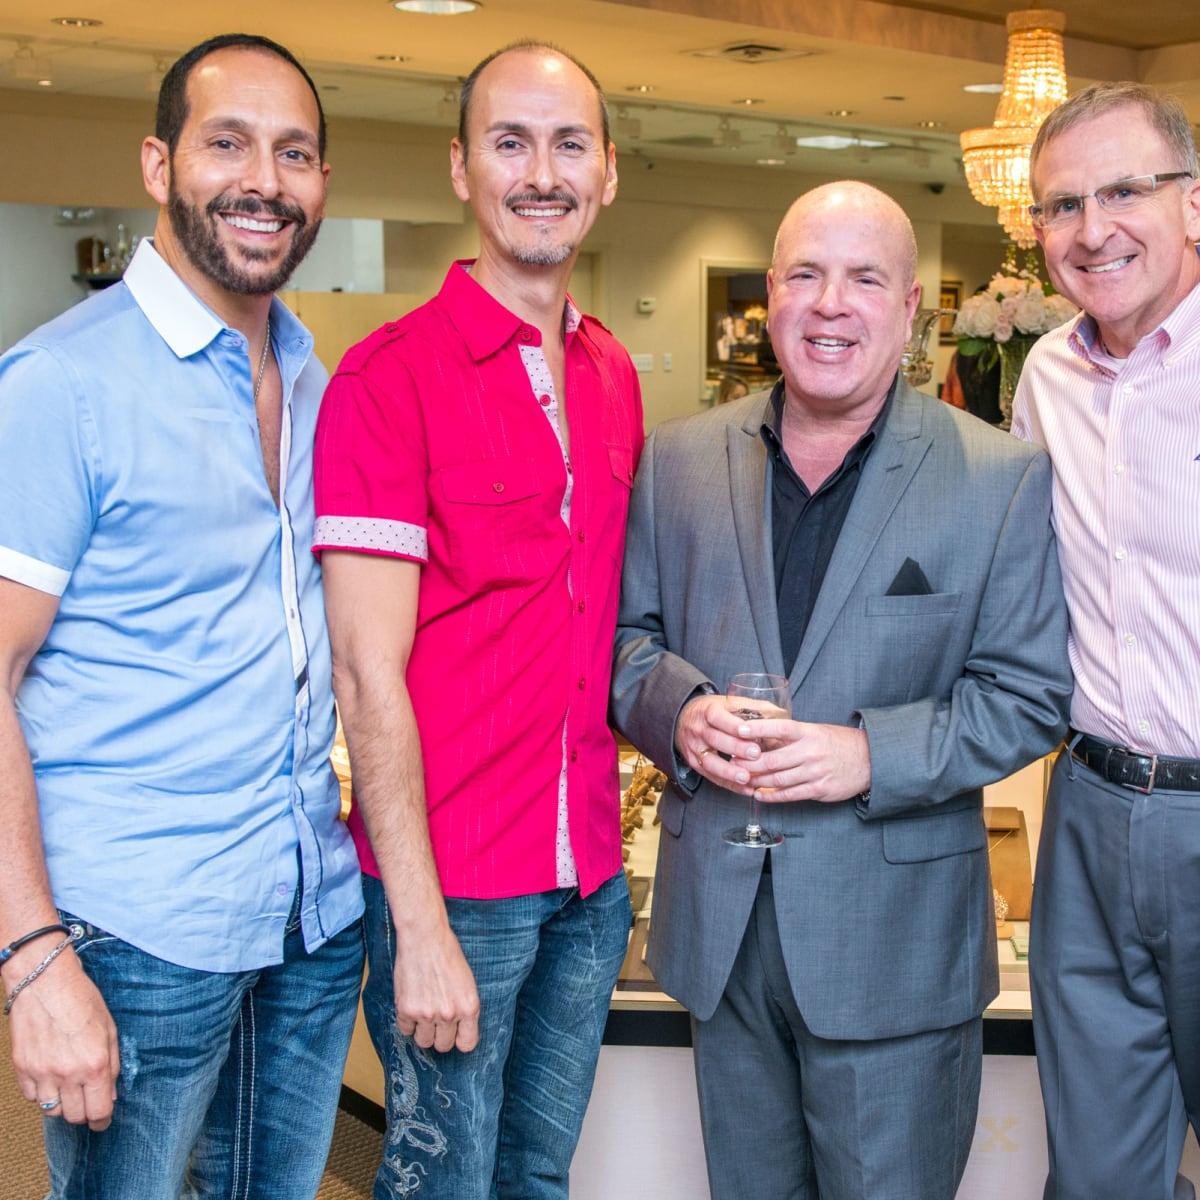 News, Shelby, IW Marks party, Sept. 2015, Jerry Gardsbane, Alex Cuevas, Danny Kallen, Jack Berger